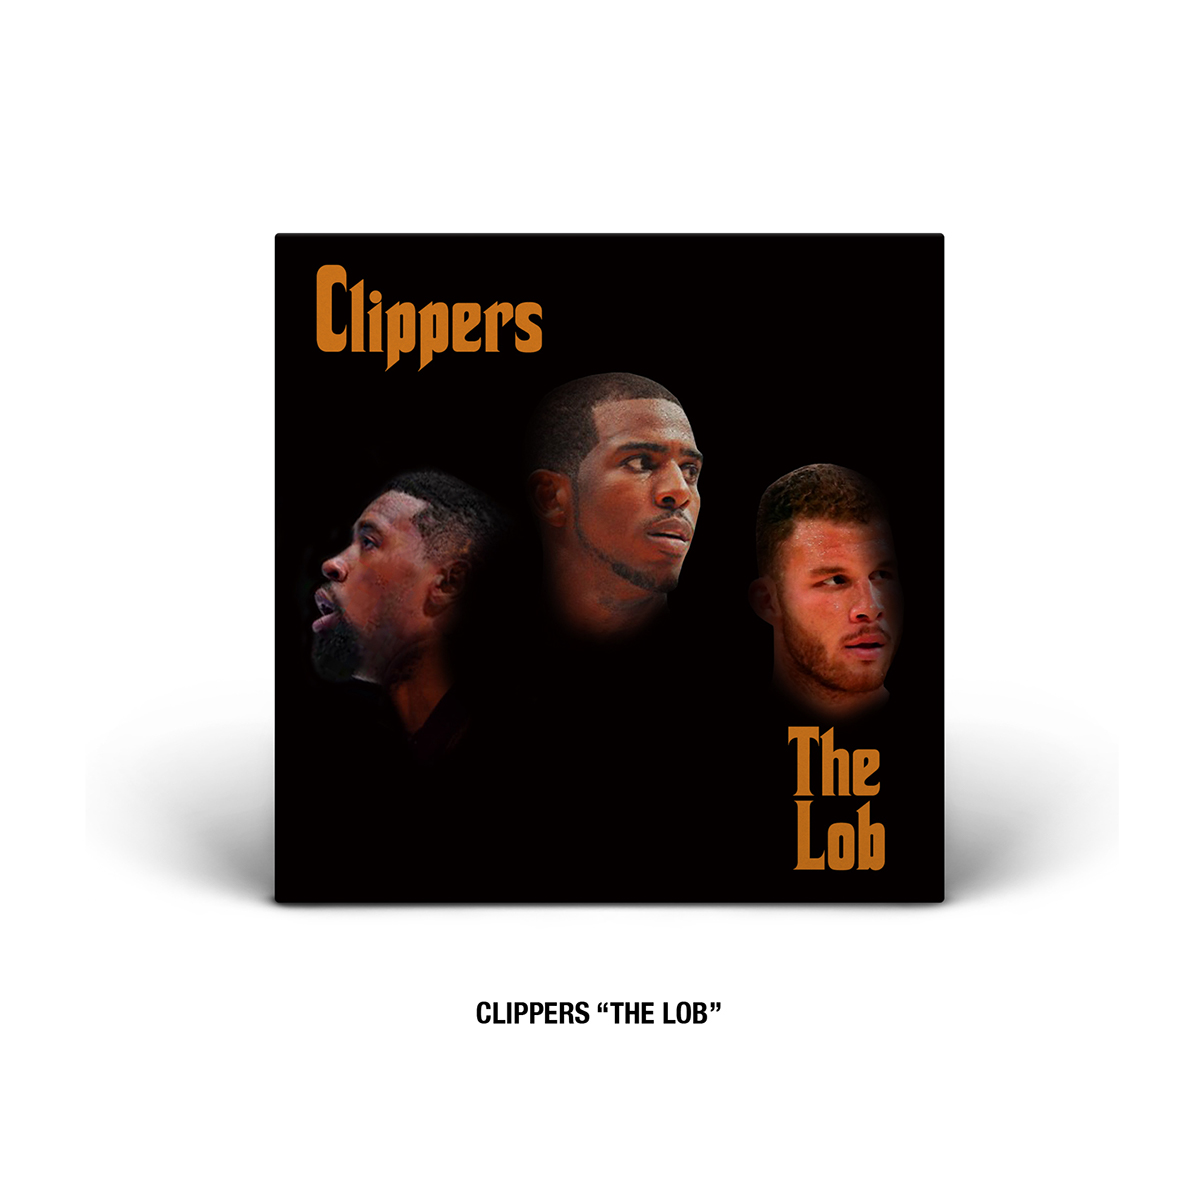 fugees the score album download